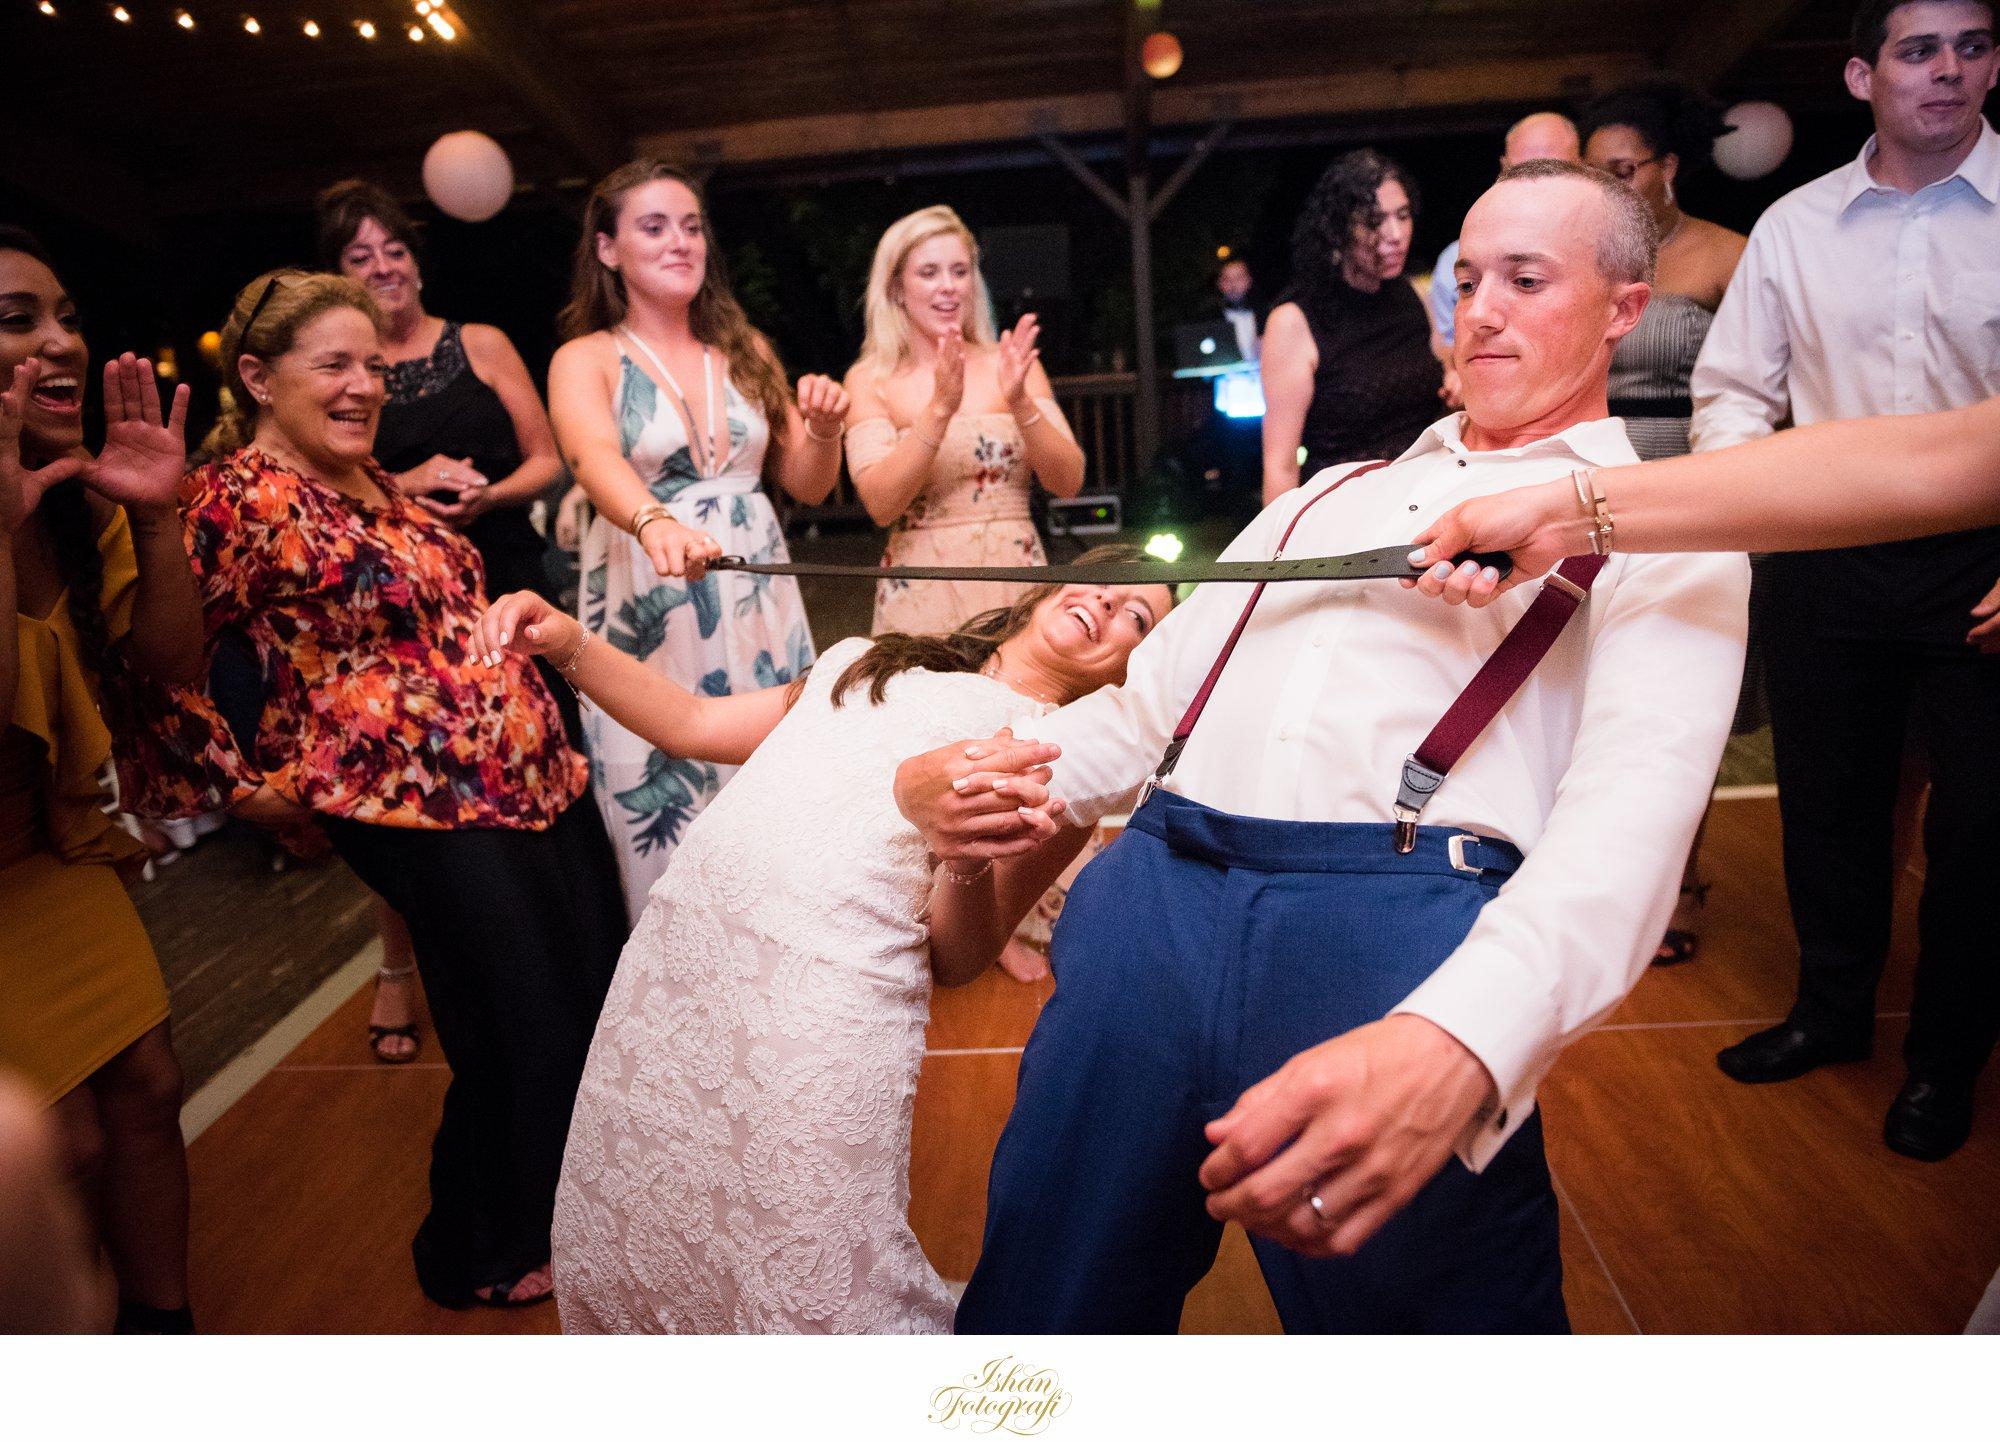 wedding-reception-photo-minerals-resort-nj